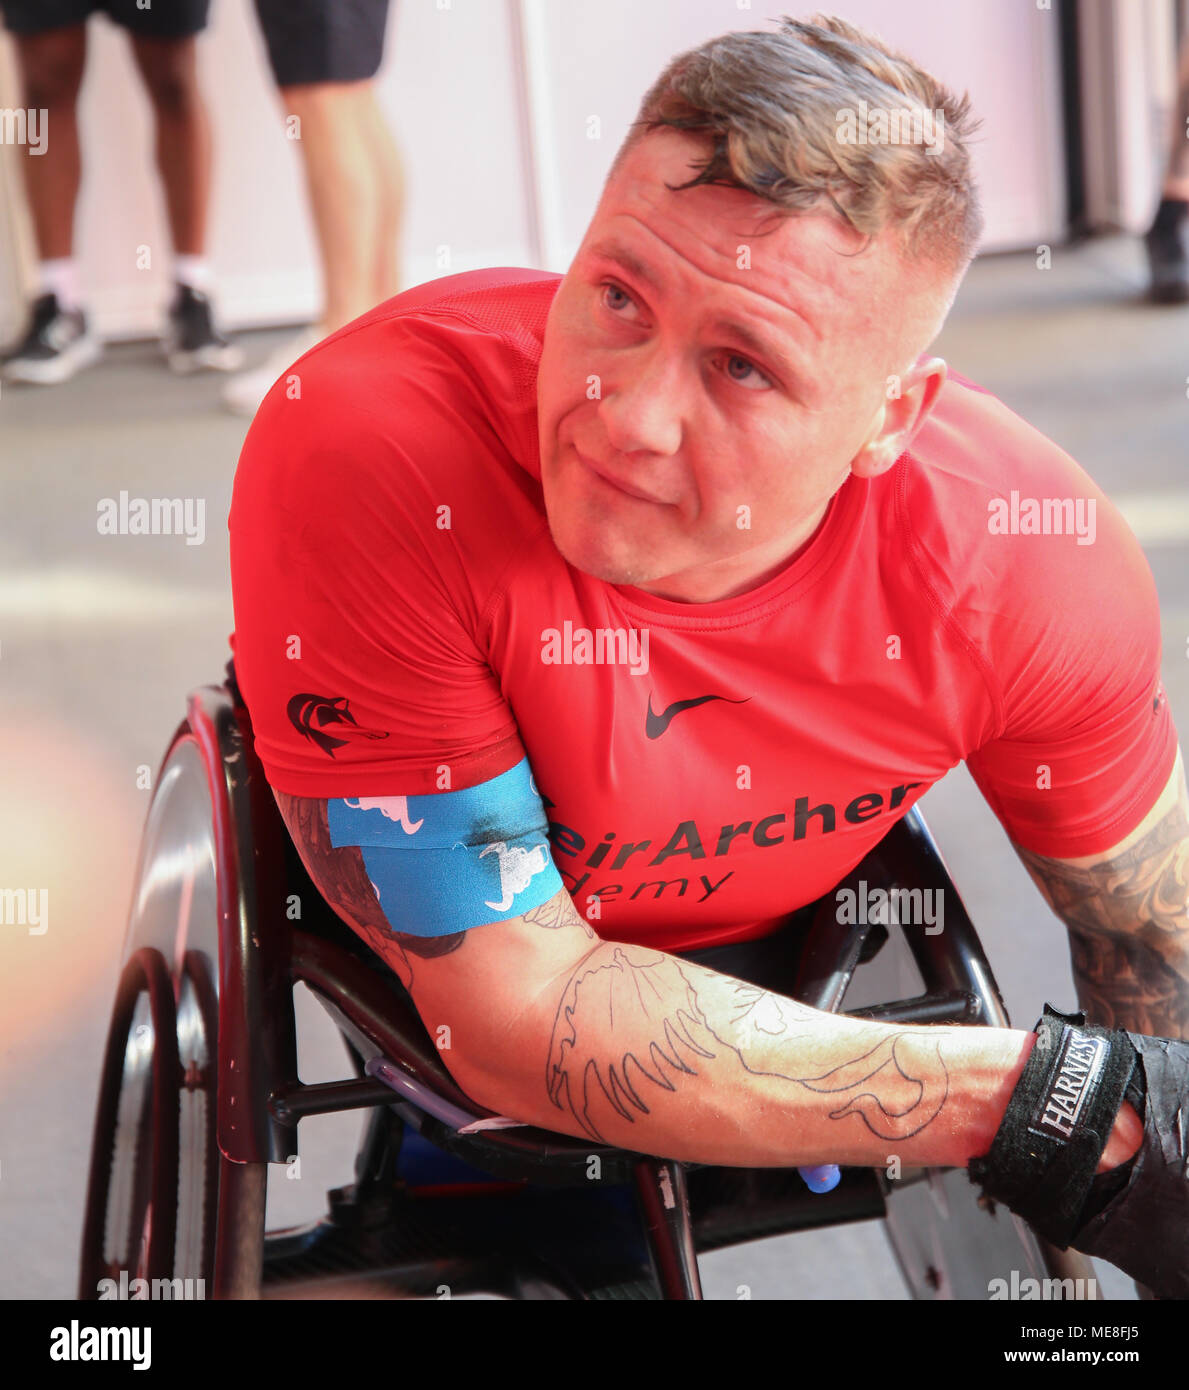 London UK 22 April 2018 David Weir winner of this year Virgin Money London Marathon wheelchair race talking to the press after the race @Paul Quezada-Neiman/Alamy Live News Stock Photo